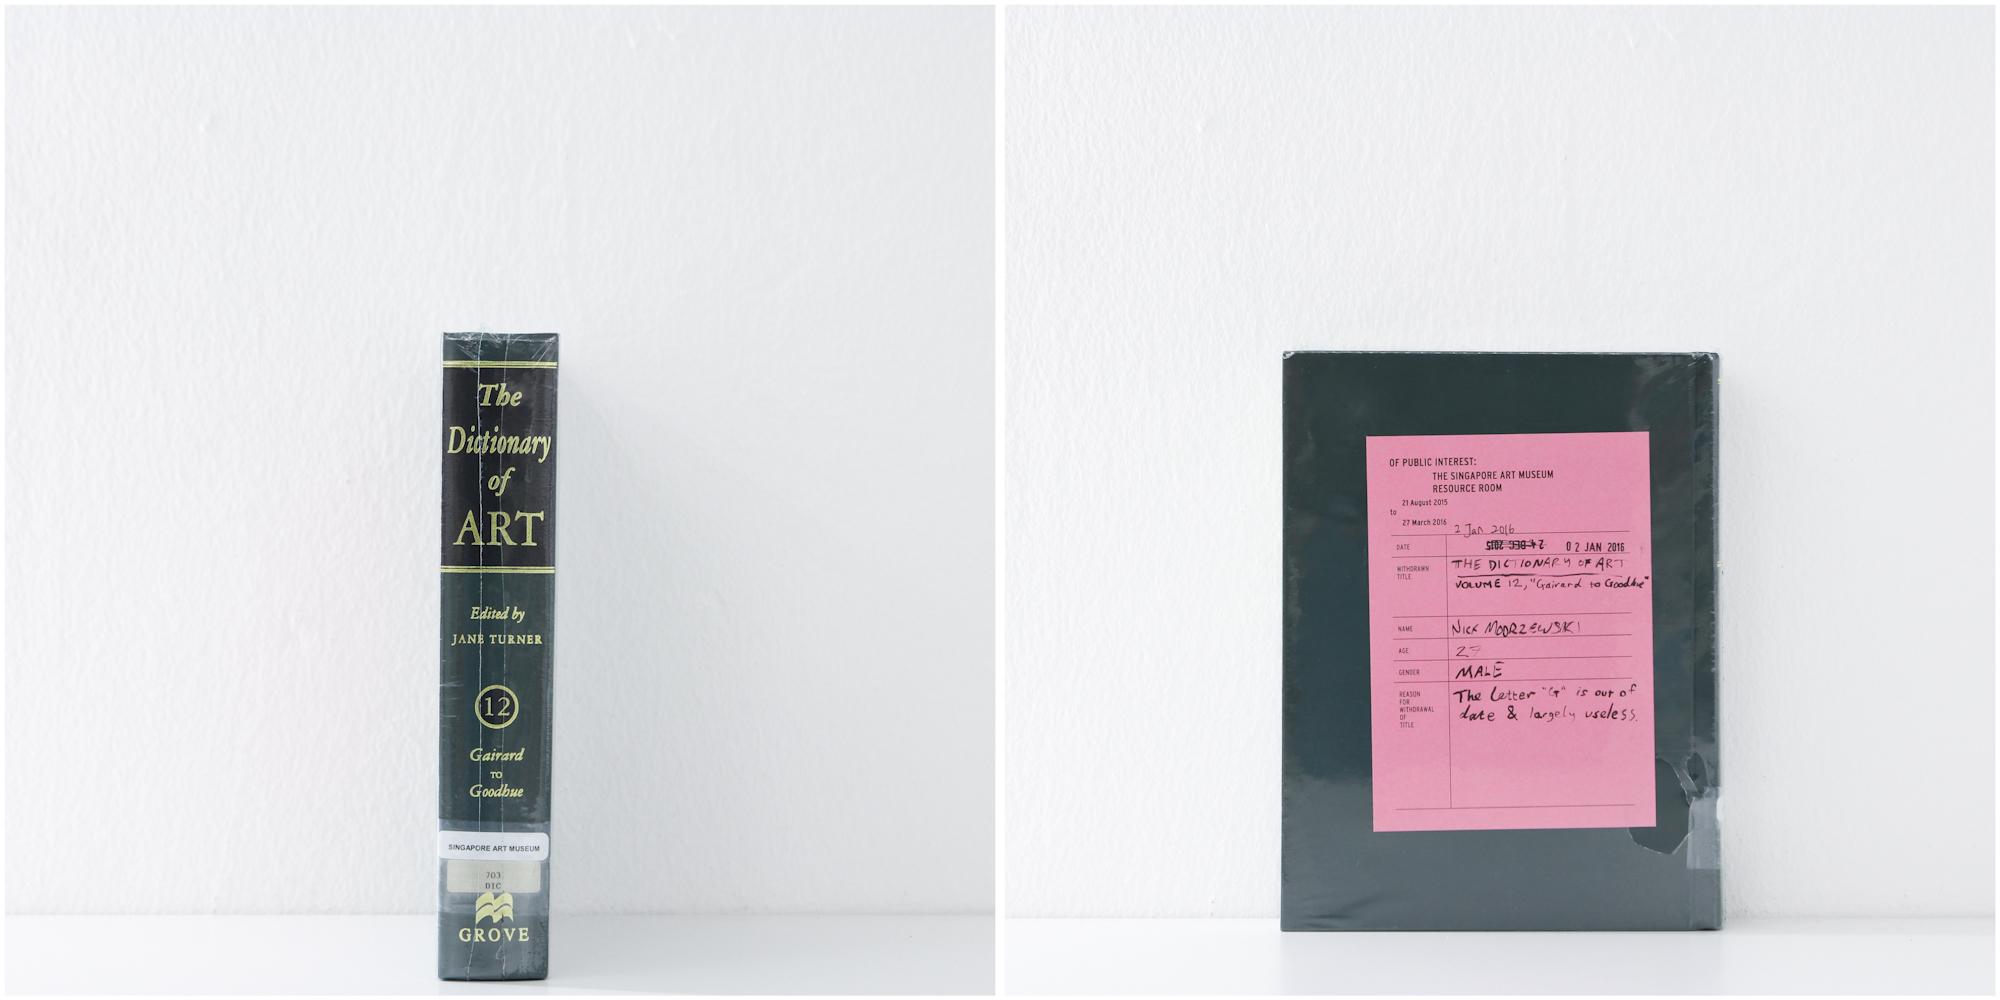 'The Dictionary of Art, No. 12', 2/1/16, Nick Modrzewski, 27, Male